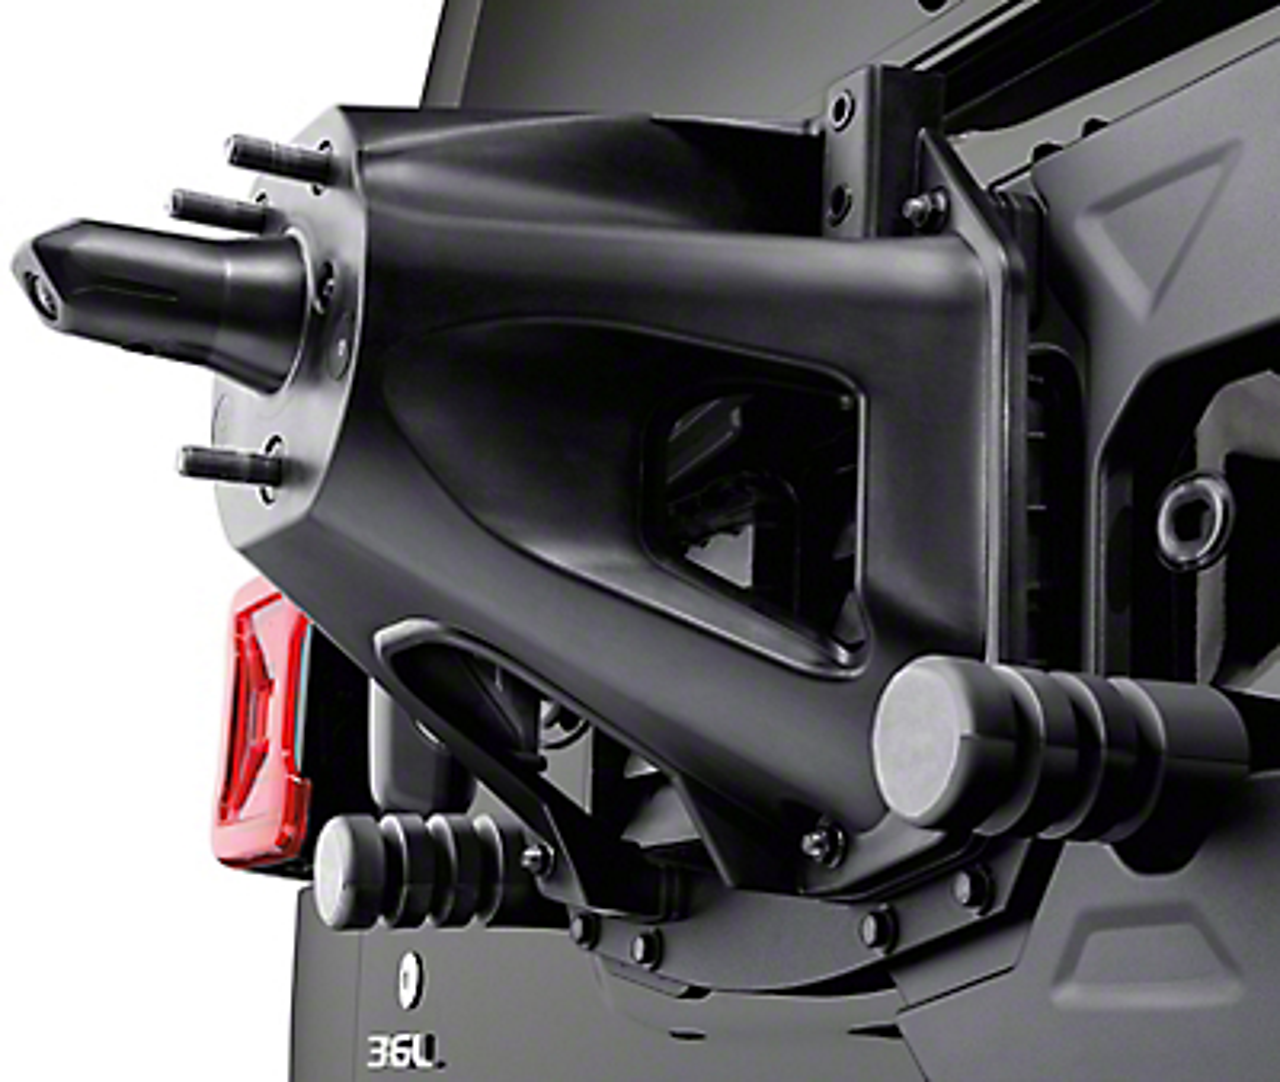 Mopar Oversize Spare Tire Carrier Mounting Bracket Kit (2018 Jeep Wrangler JL)